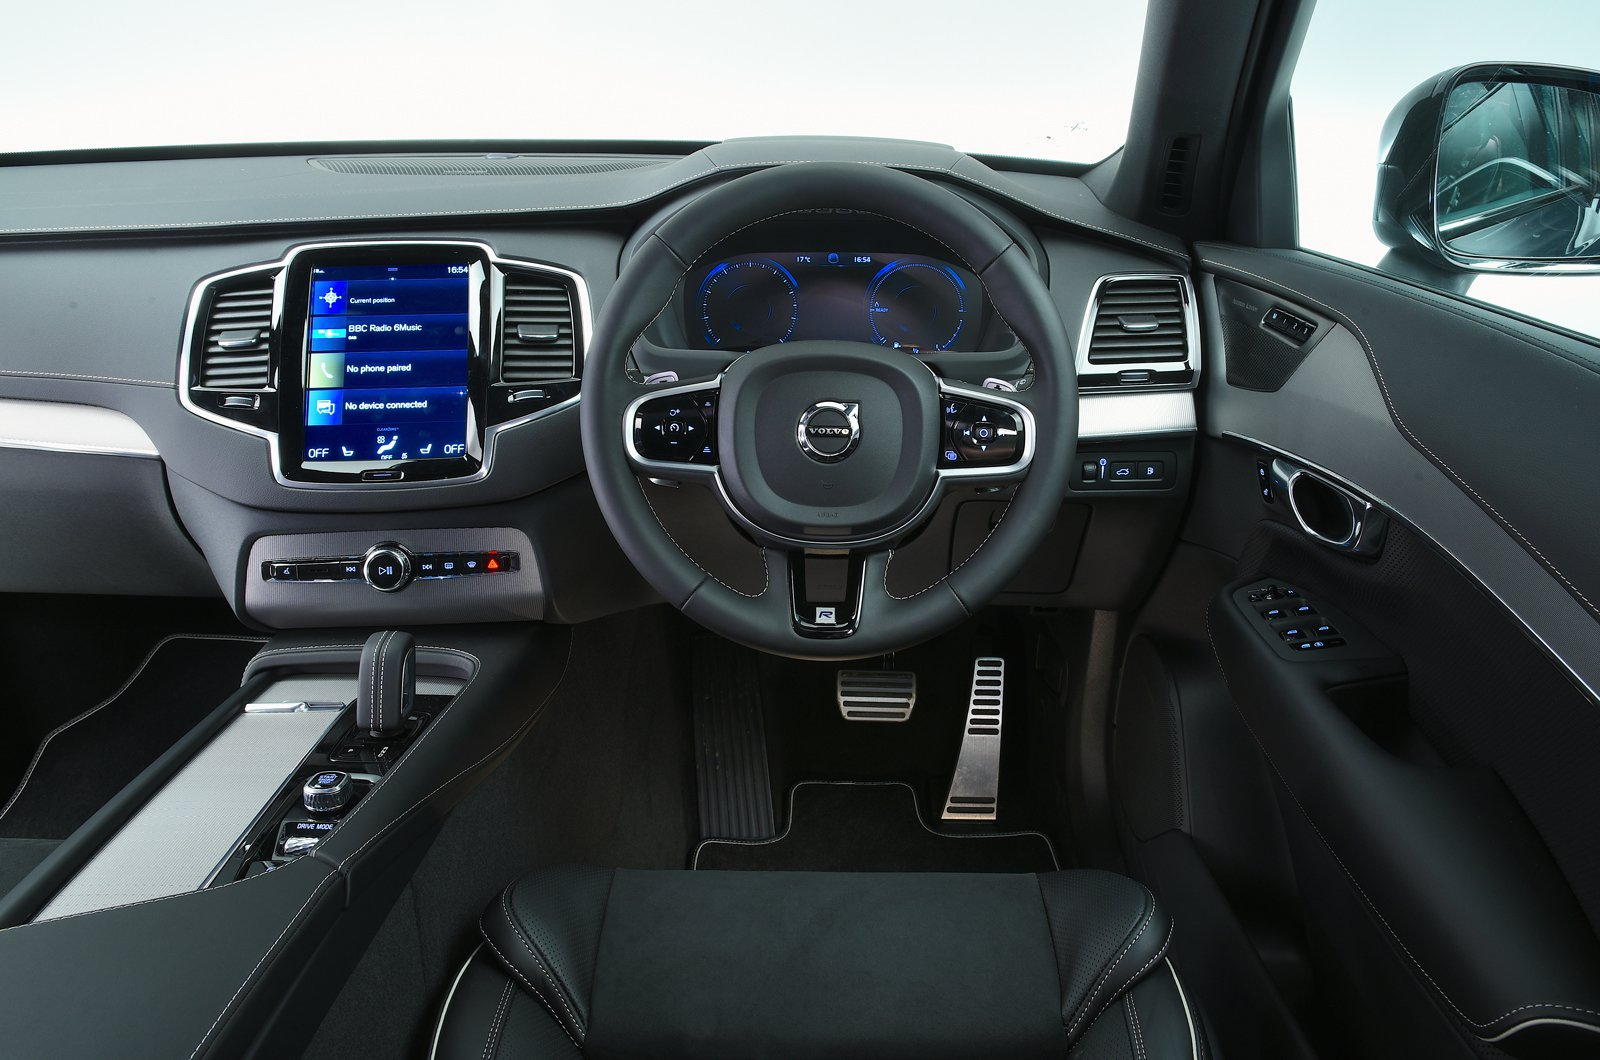 Volvo XC90 T8 dashboard - 69-plate car